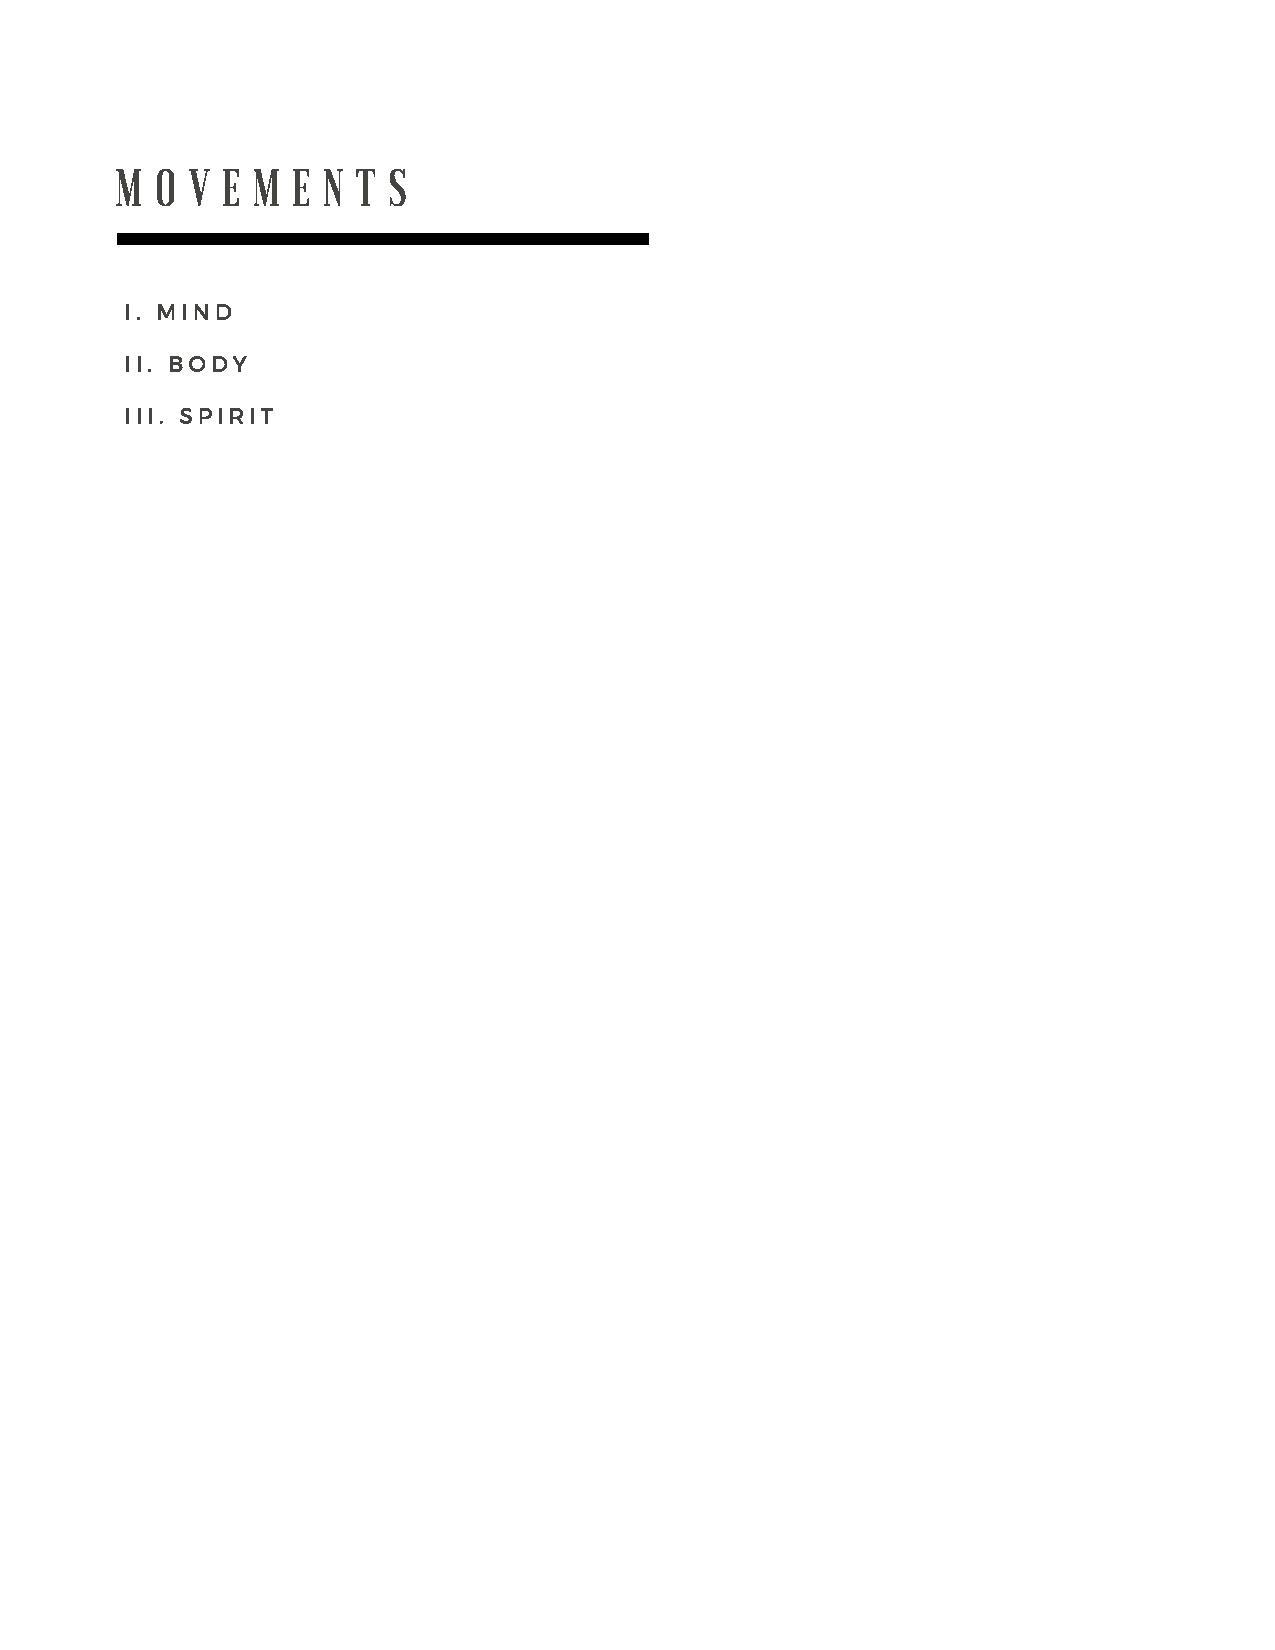 Boyd Amare Score_watermark-3-page-006.jpg